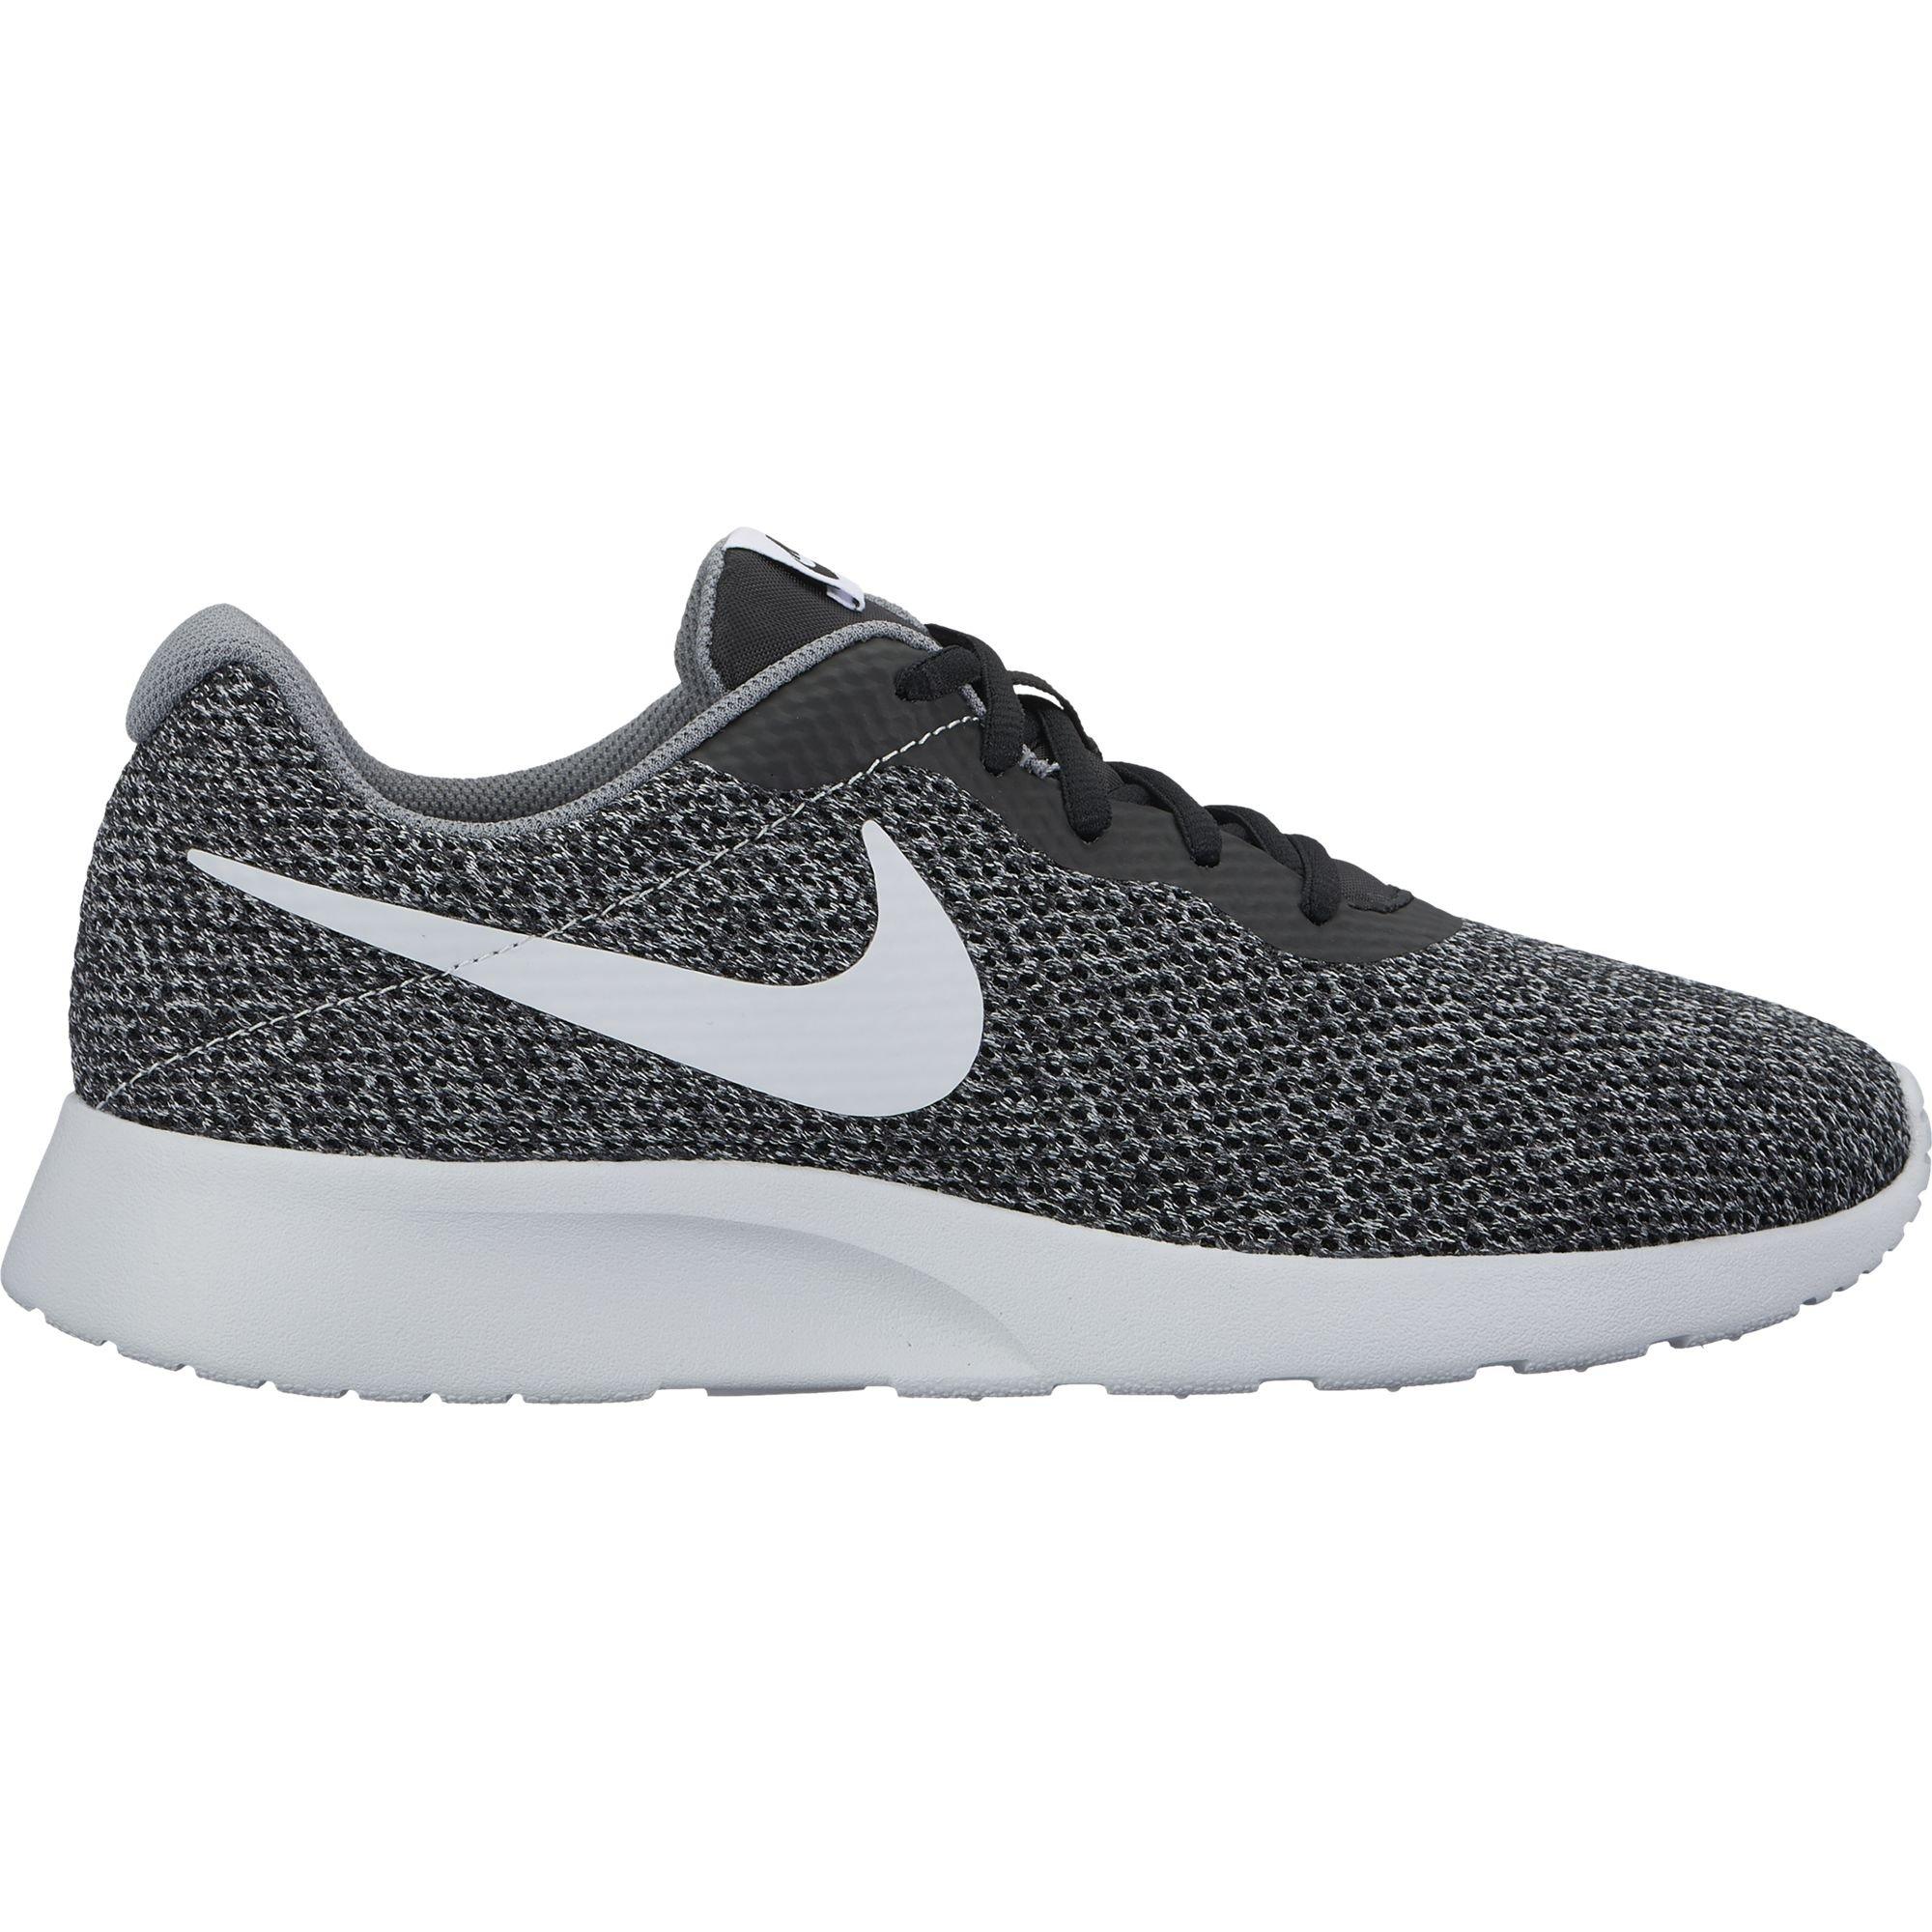 Nike 844887-010 : Tanjun SE Running Shoes Black/Pure Platinum/Cool Grey (11 D(M) US)